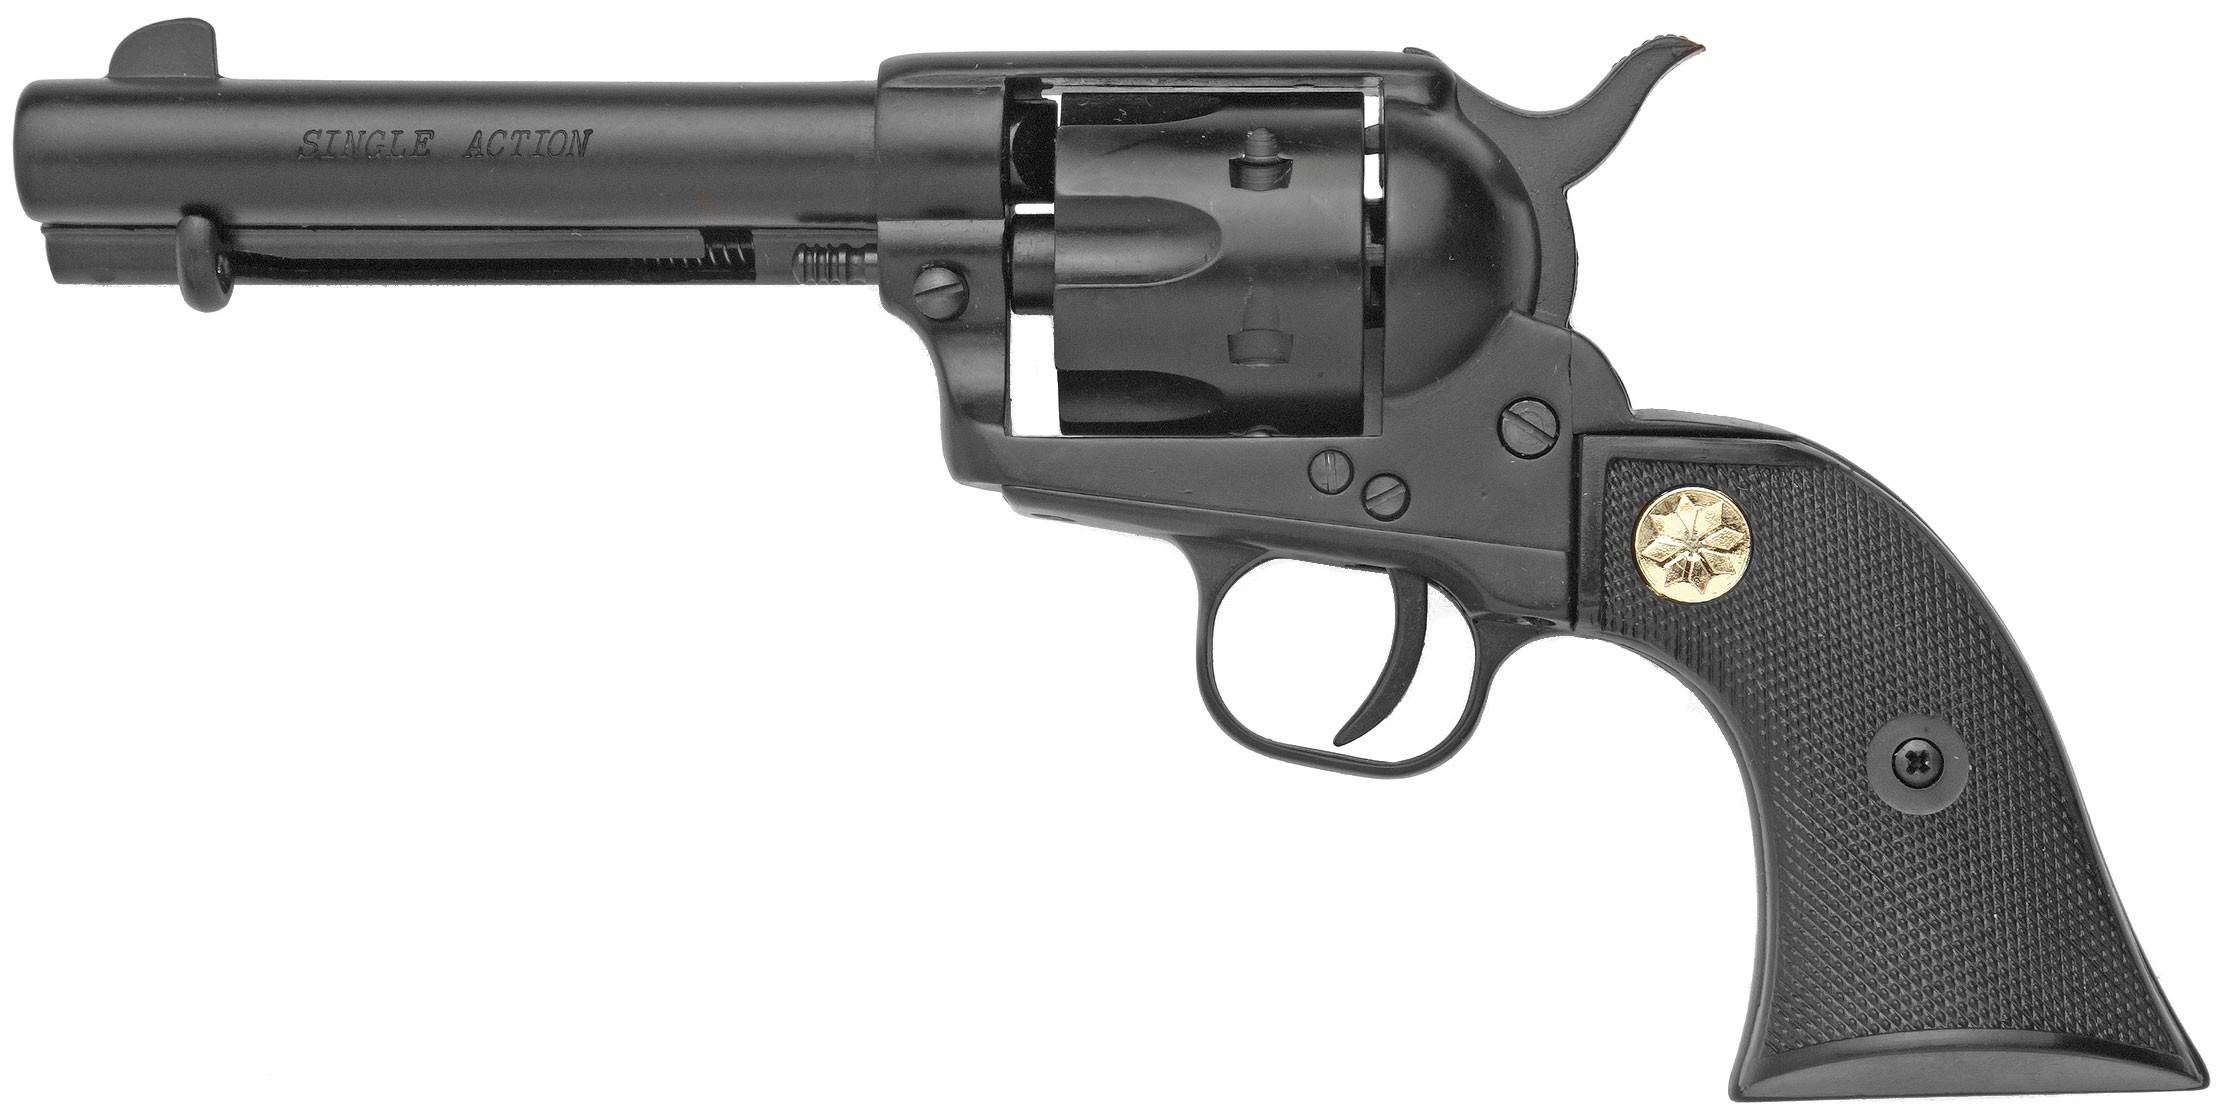 Drawn pistol western gun  Guns: 9mm West Blank